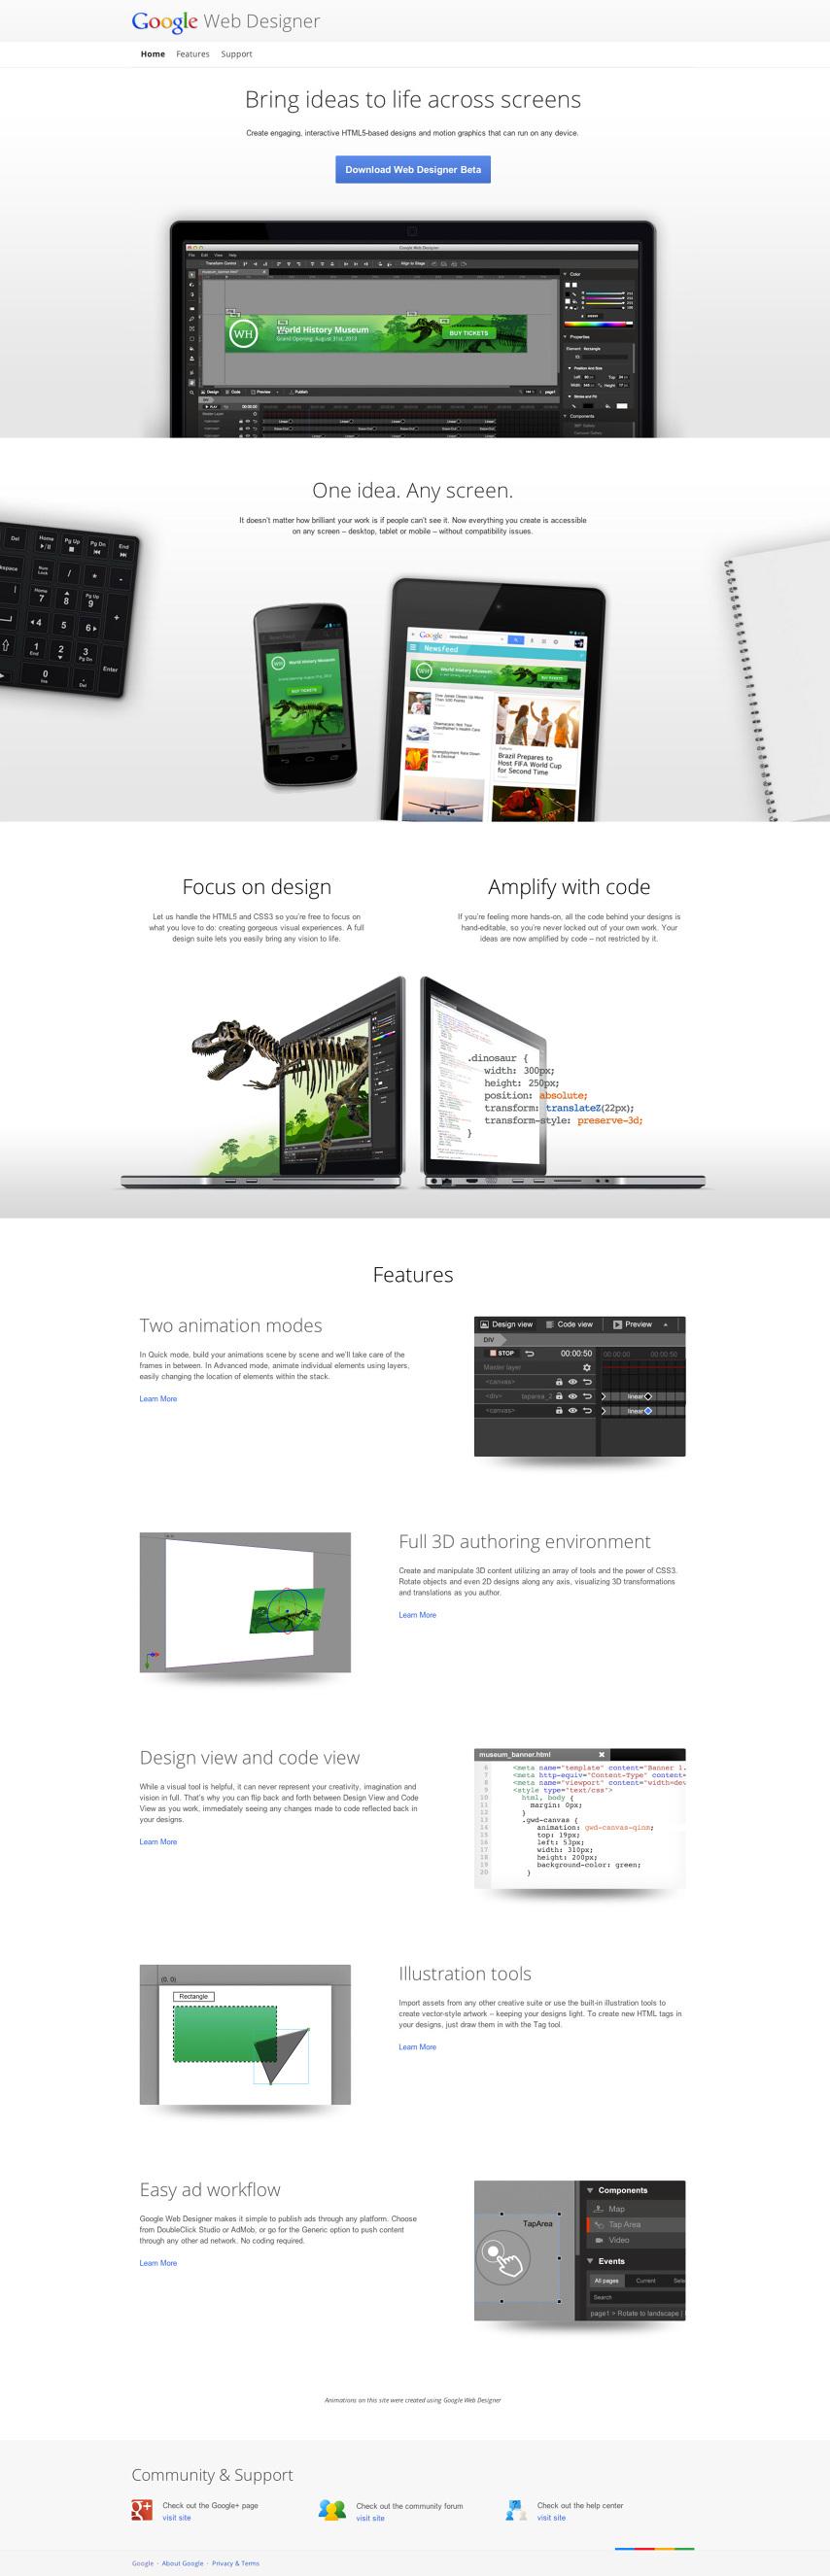 google web designer 3d animation